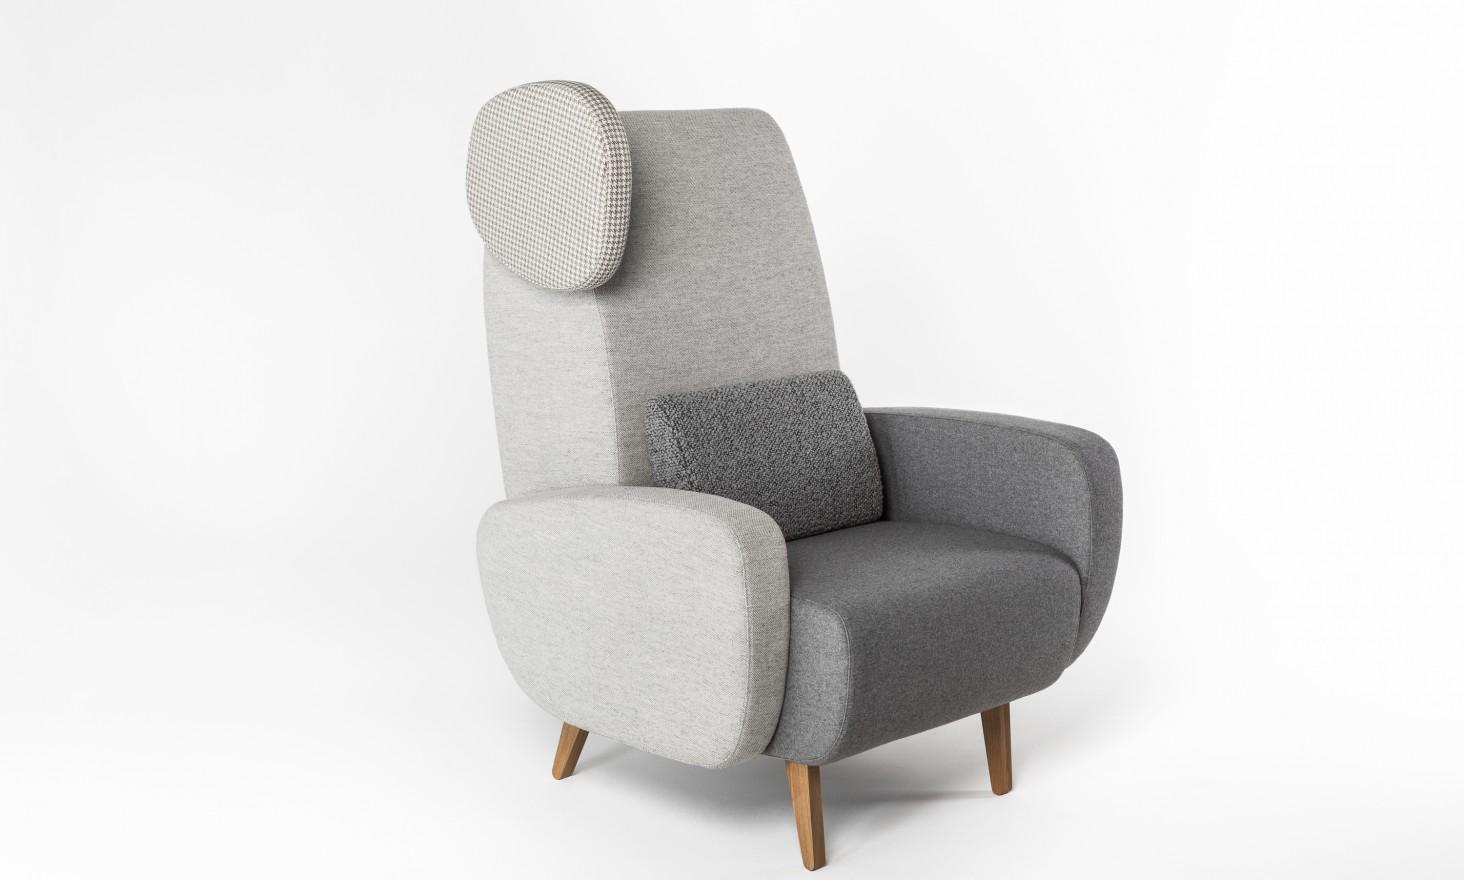 TEDDY_BEAR_packshot_armchair 3